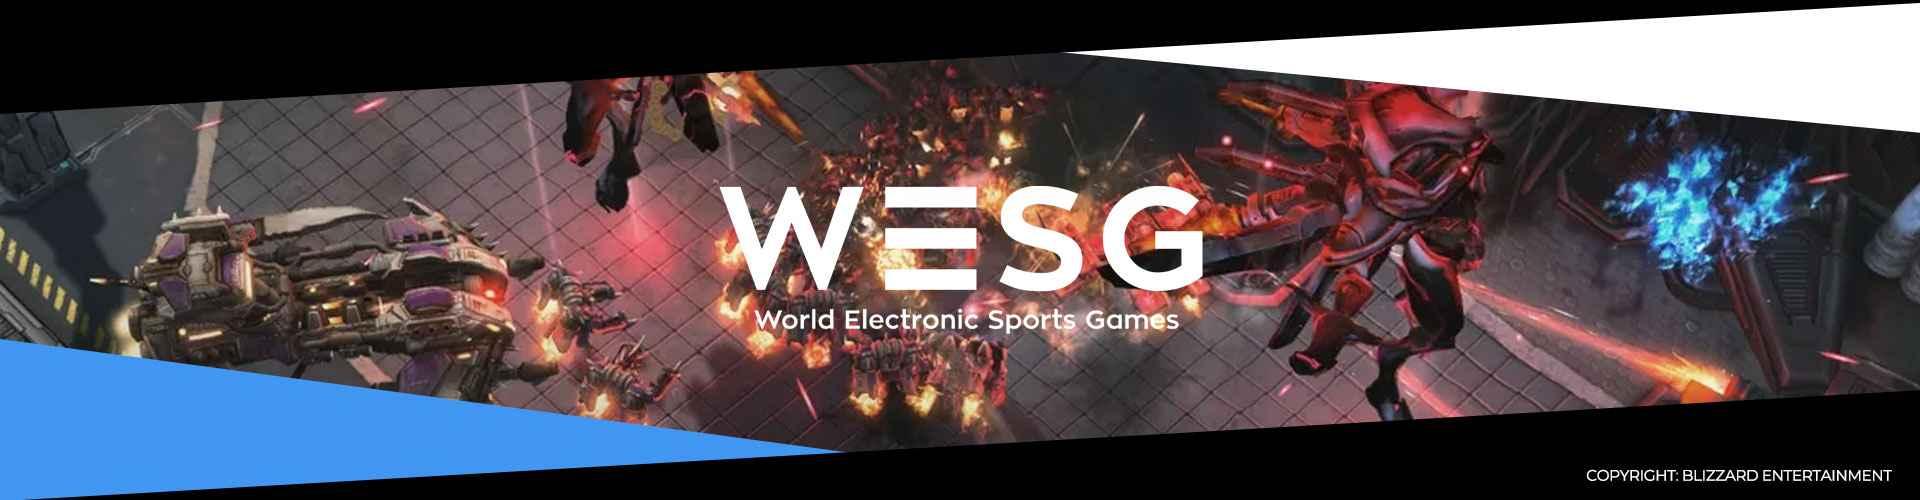 Starcraft 2 - WESG 2018